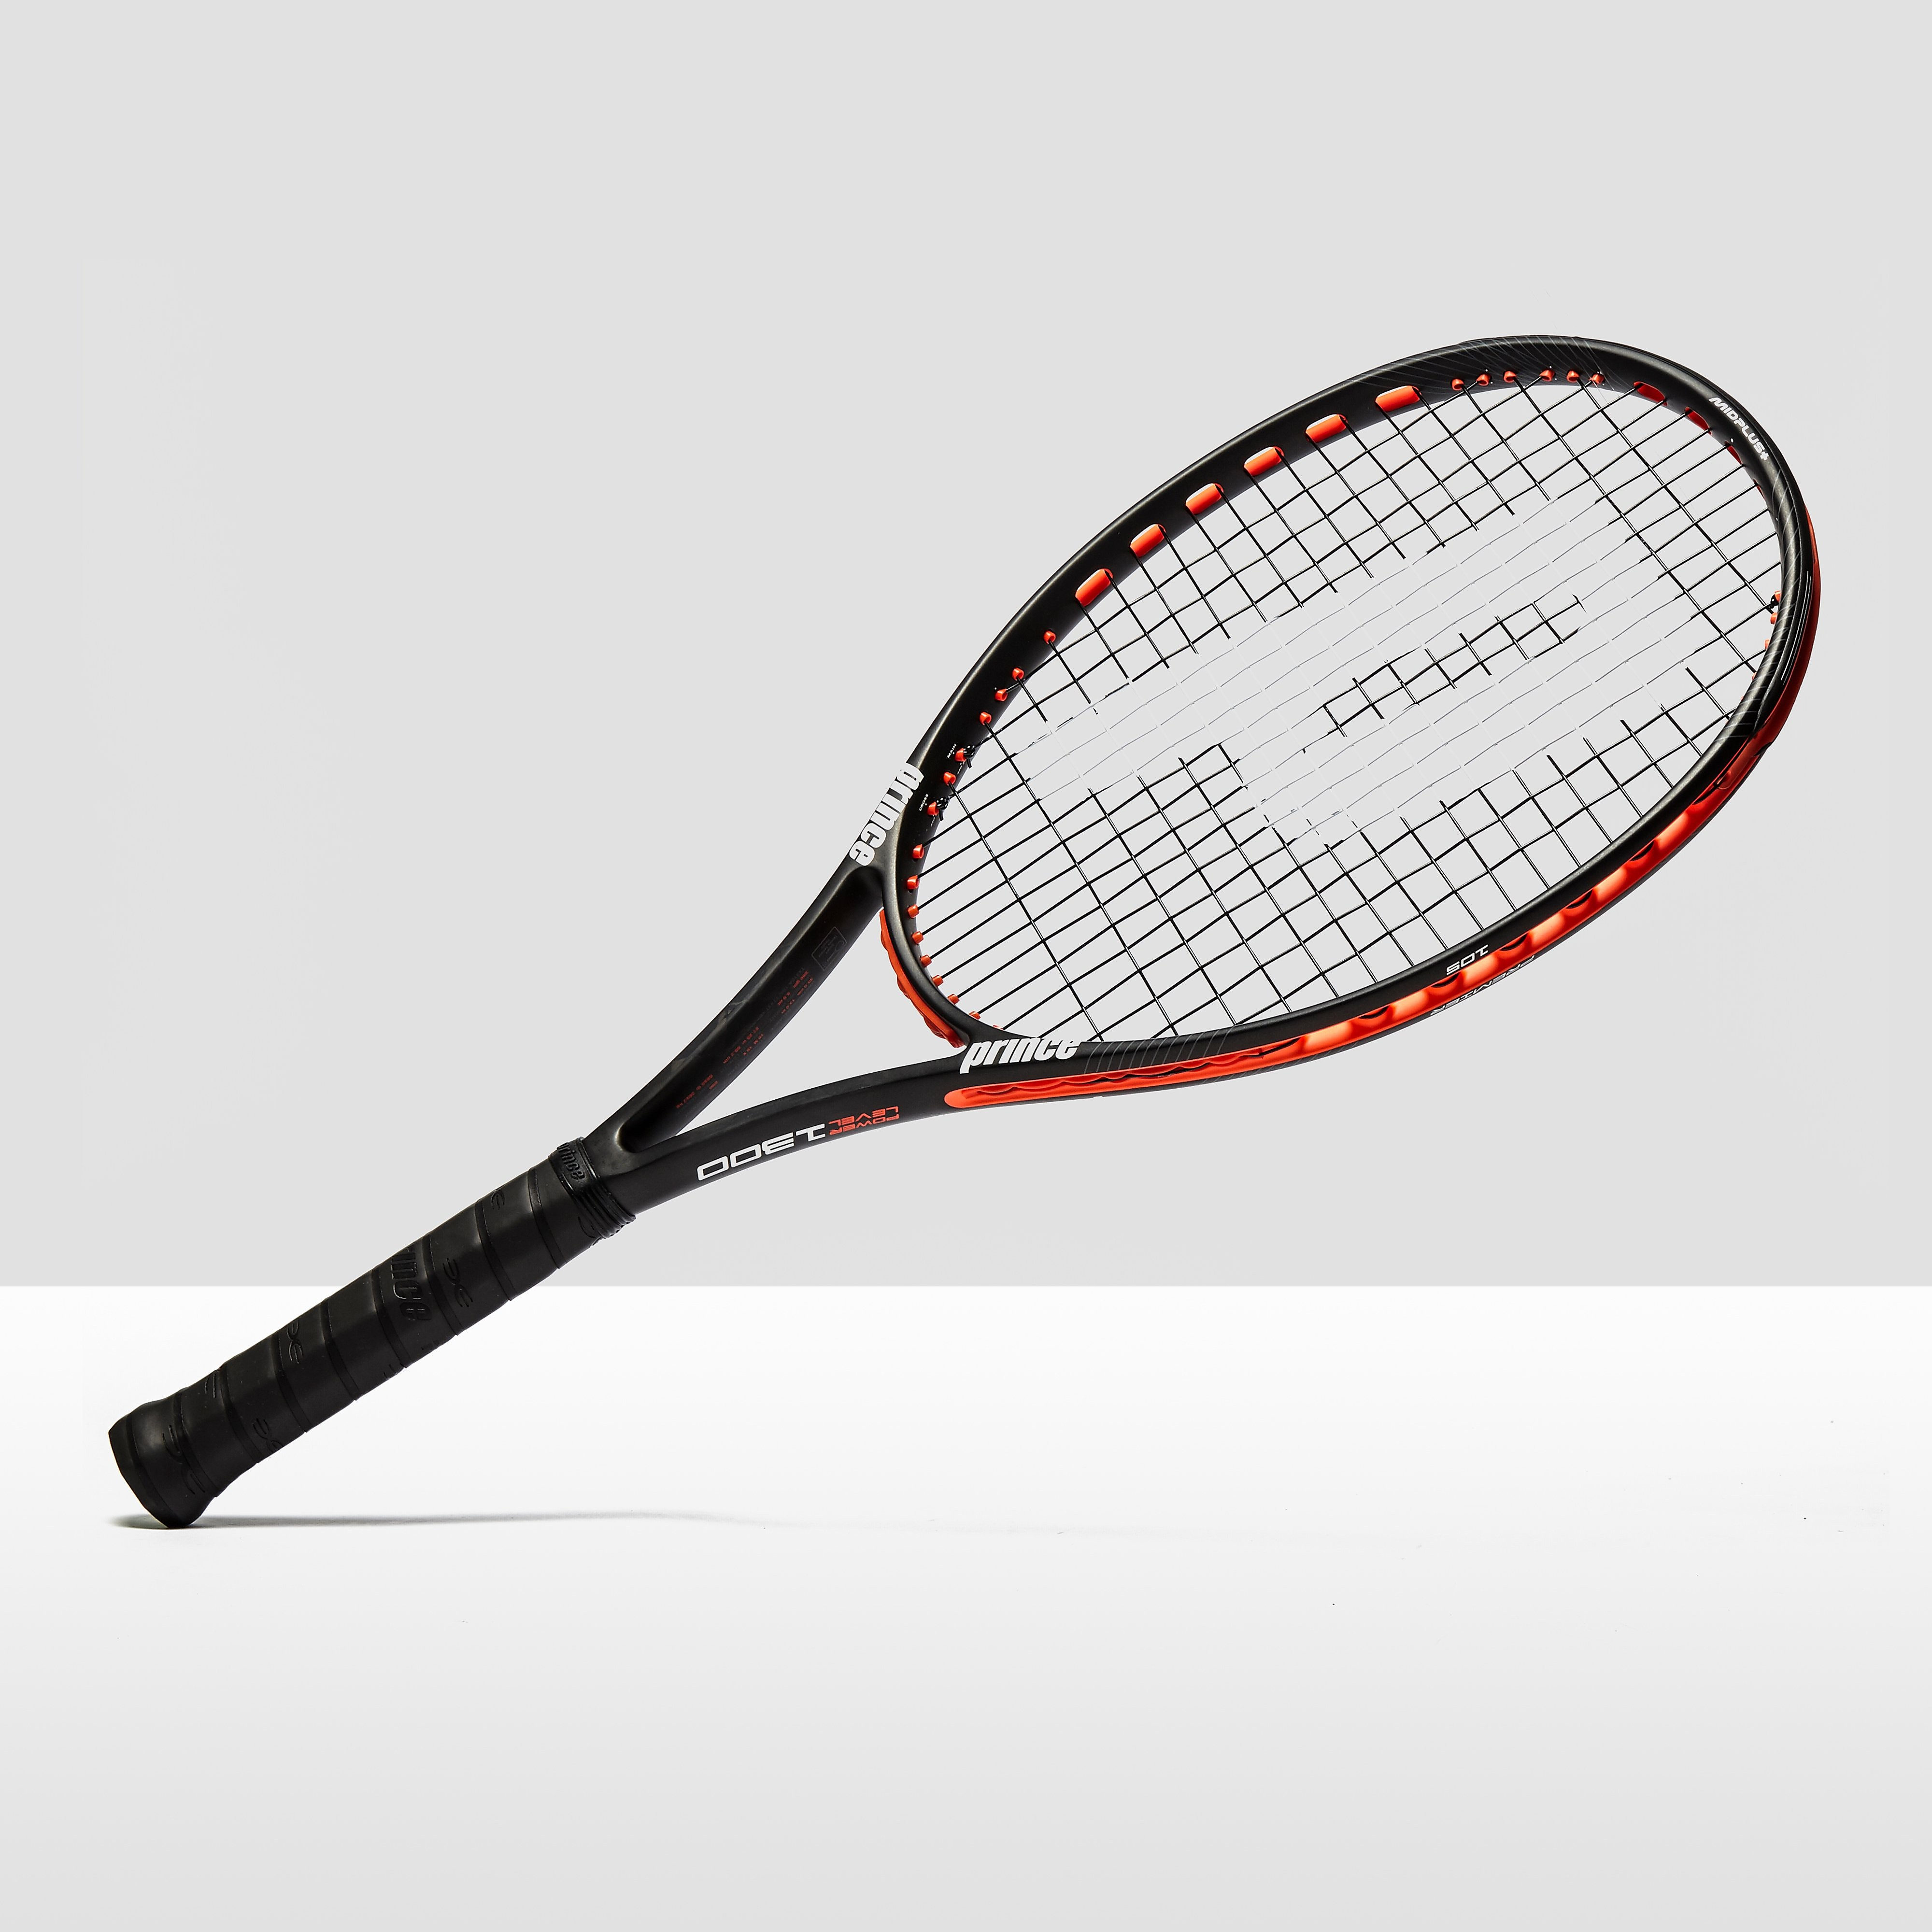 Prince Premier 105 Tennis Racket